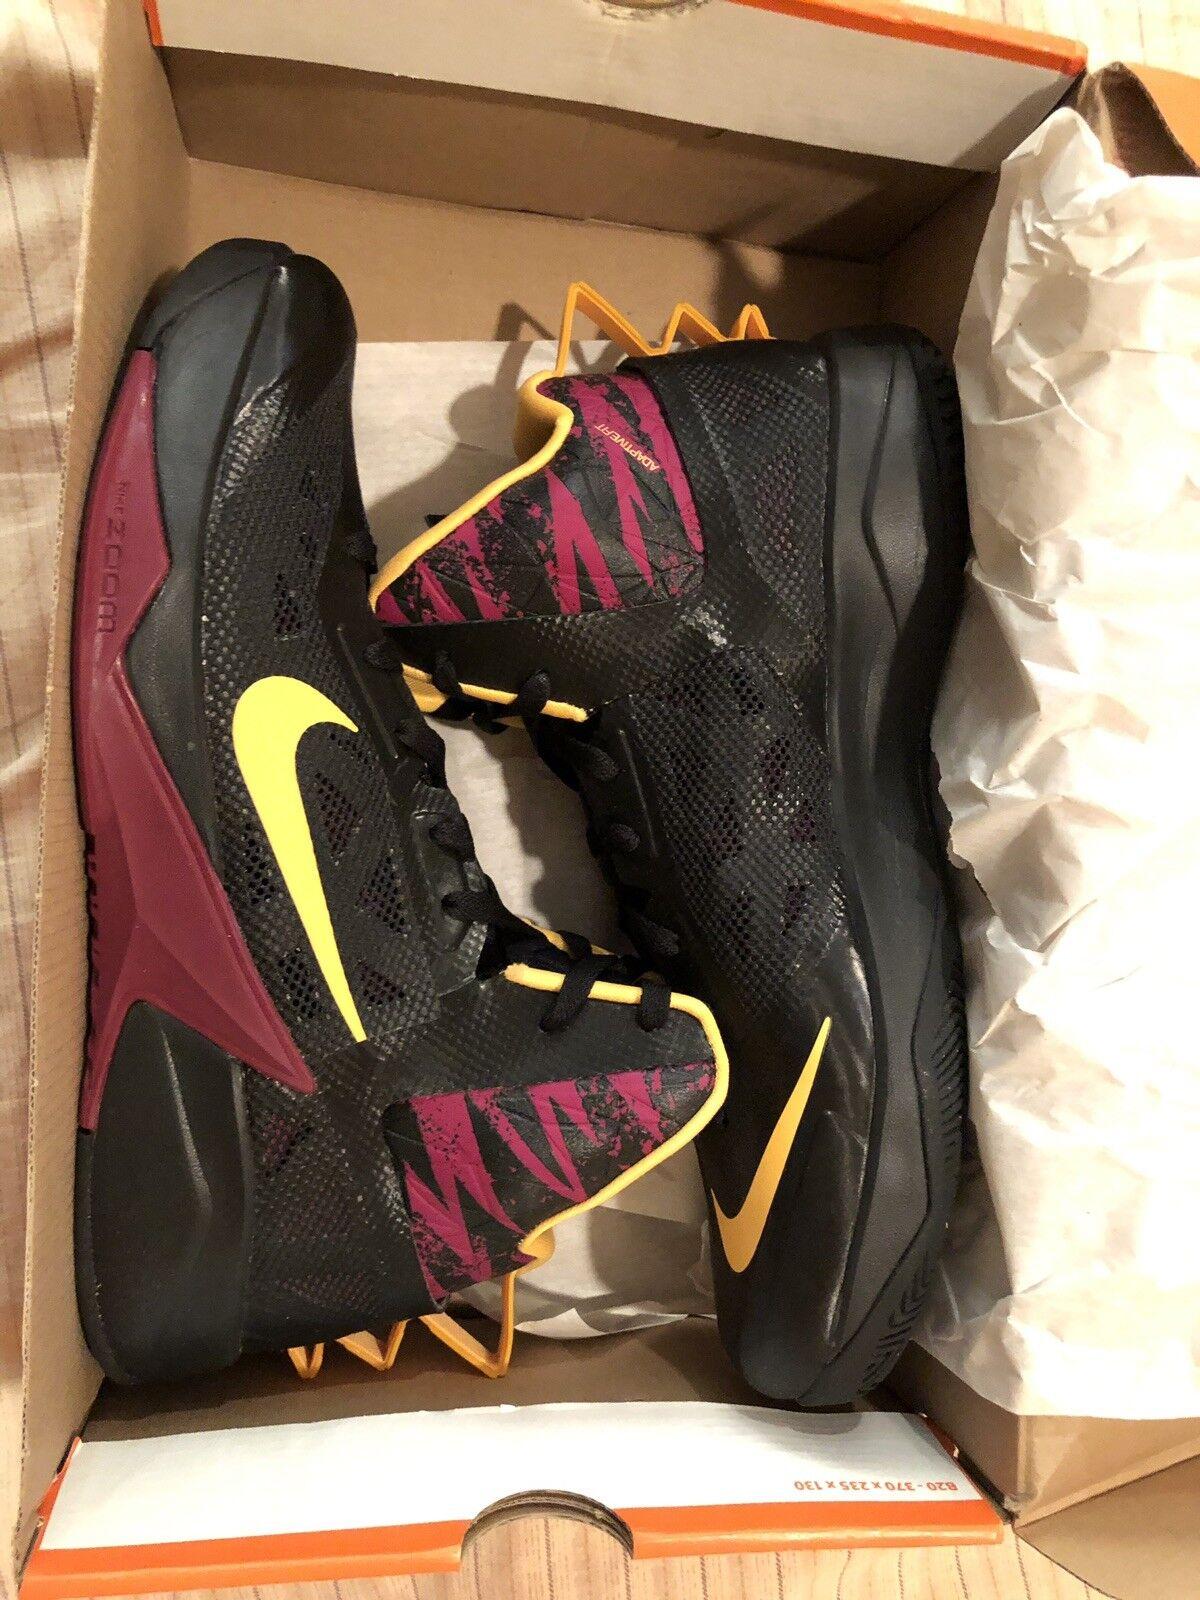 Nike Zoom Hyperfuse 2013 Men's Basketball shoes Size 11.5 (BLACK orange RED)